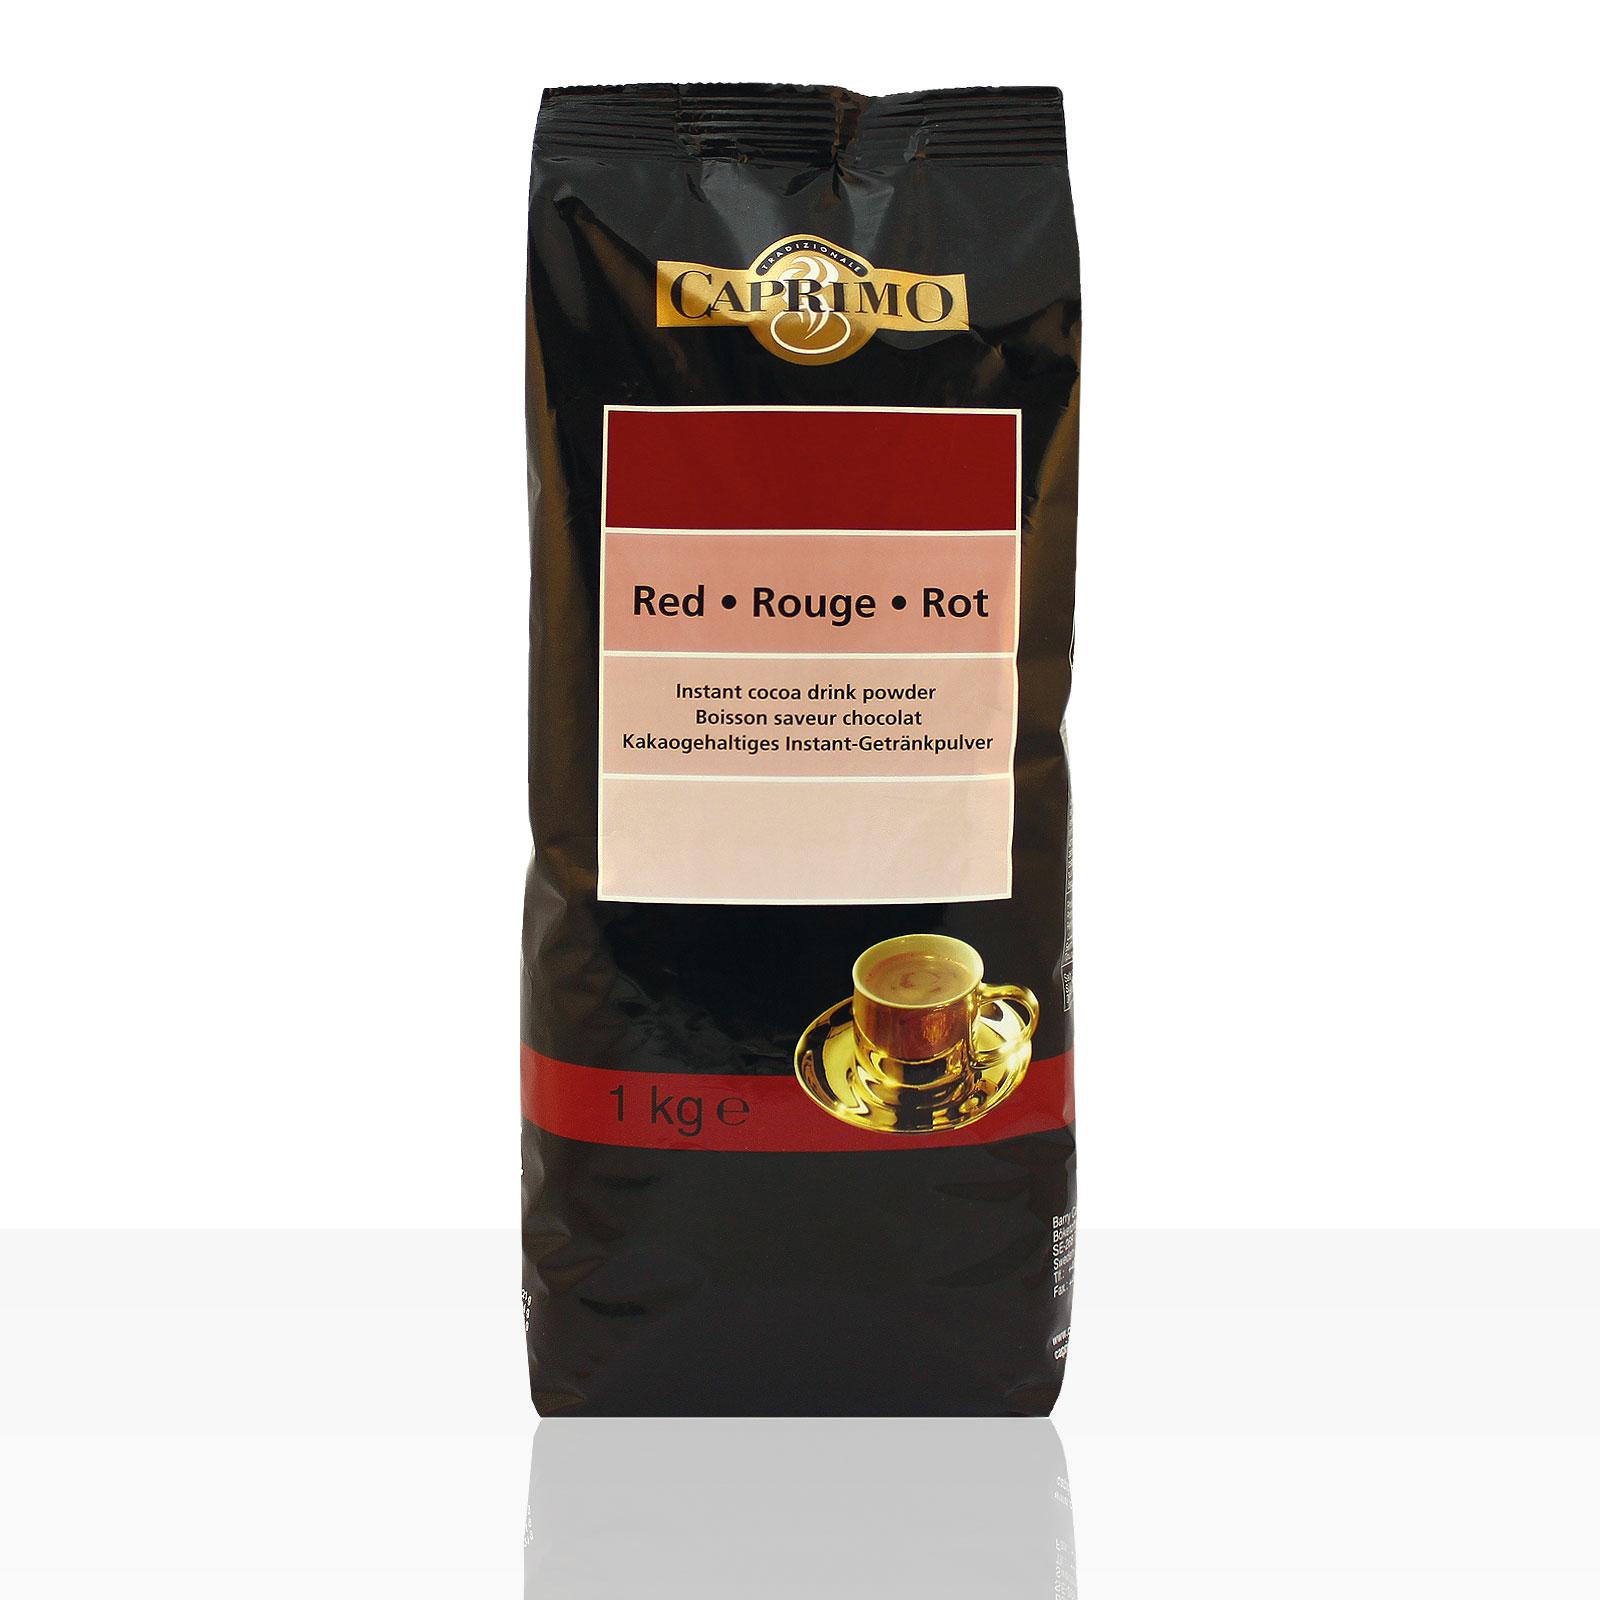 Caprimo Instant Choco Red 1kg Kakao, 16% Kakaopulver